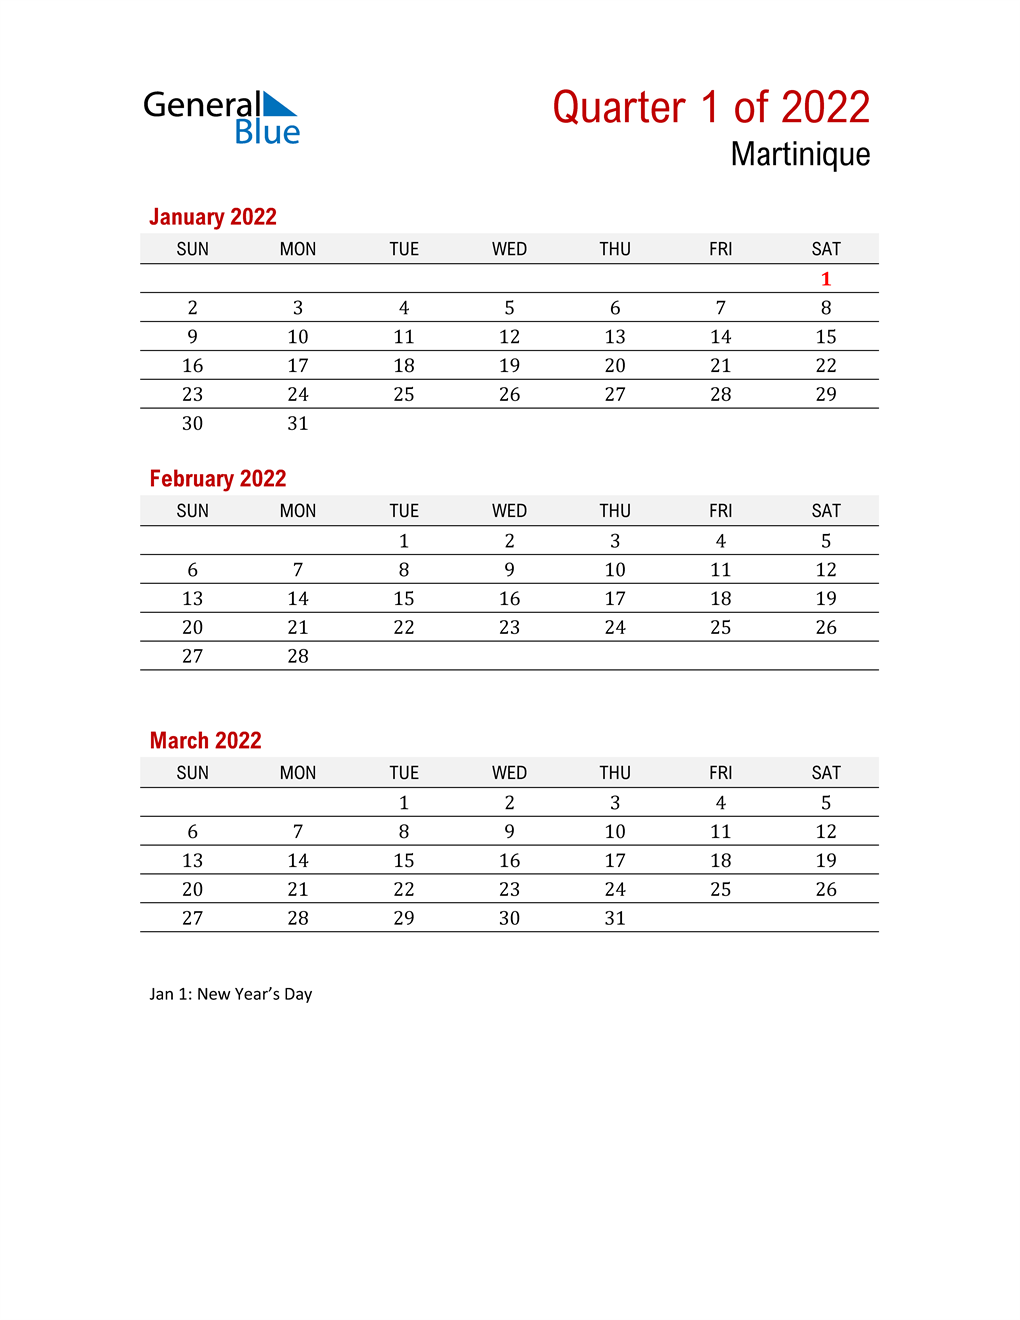 Printable Three Month Calendar for Martinique